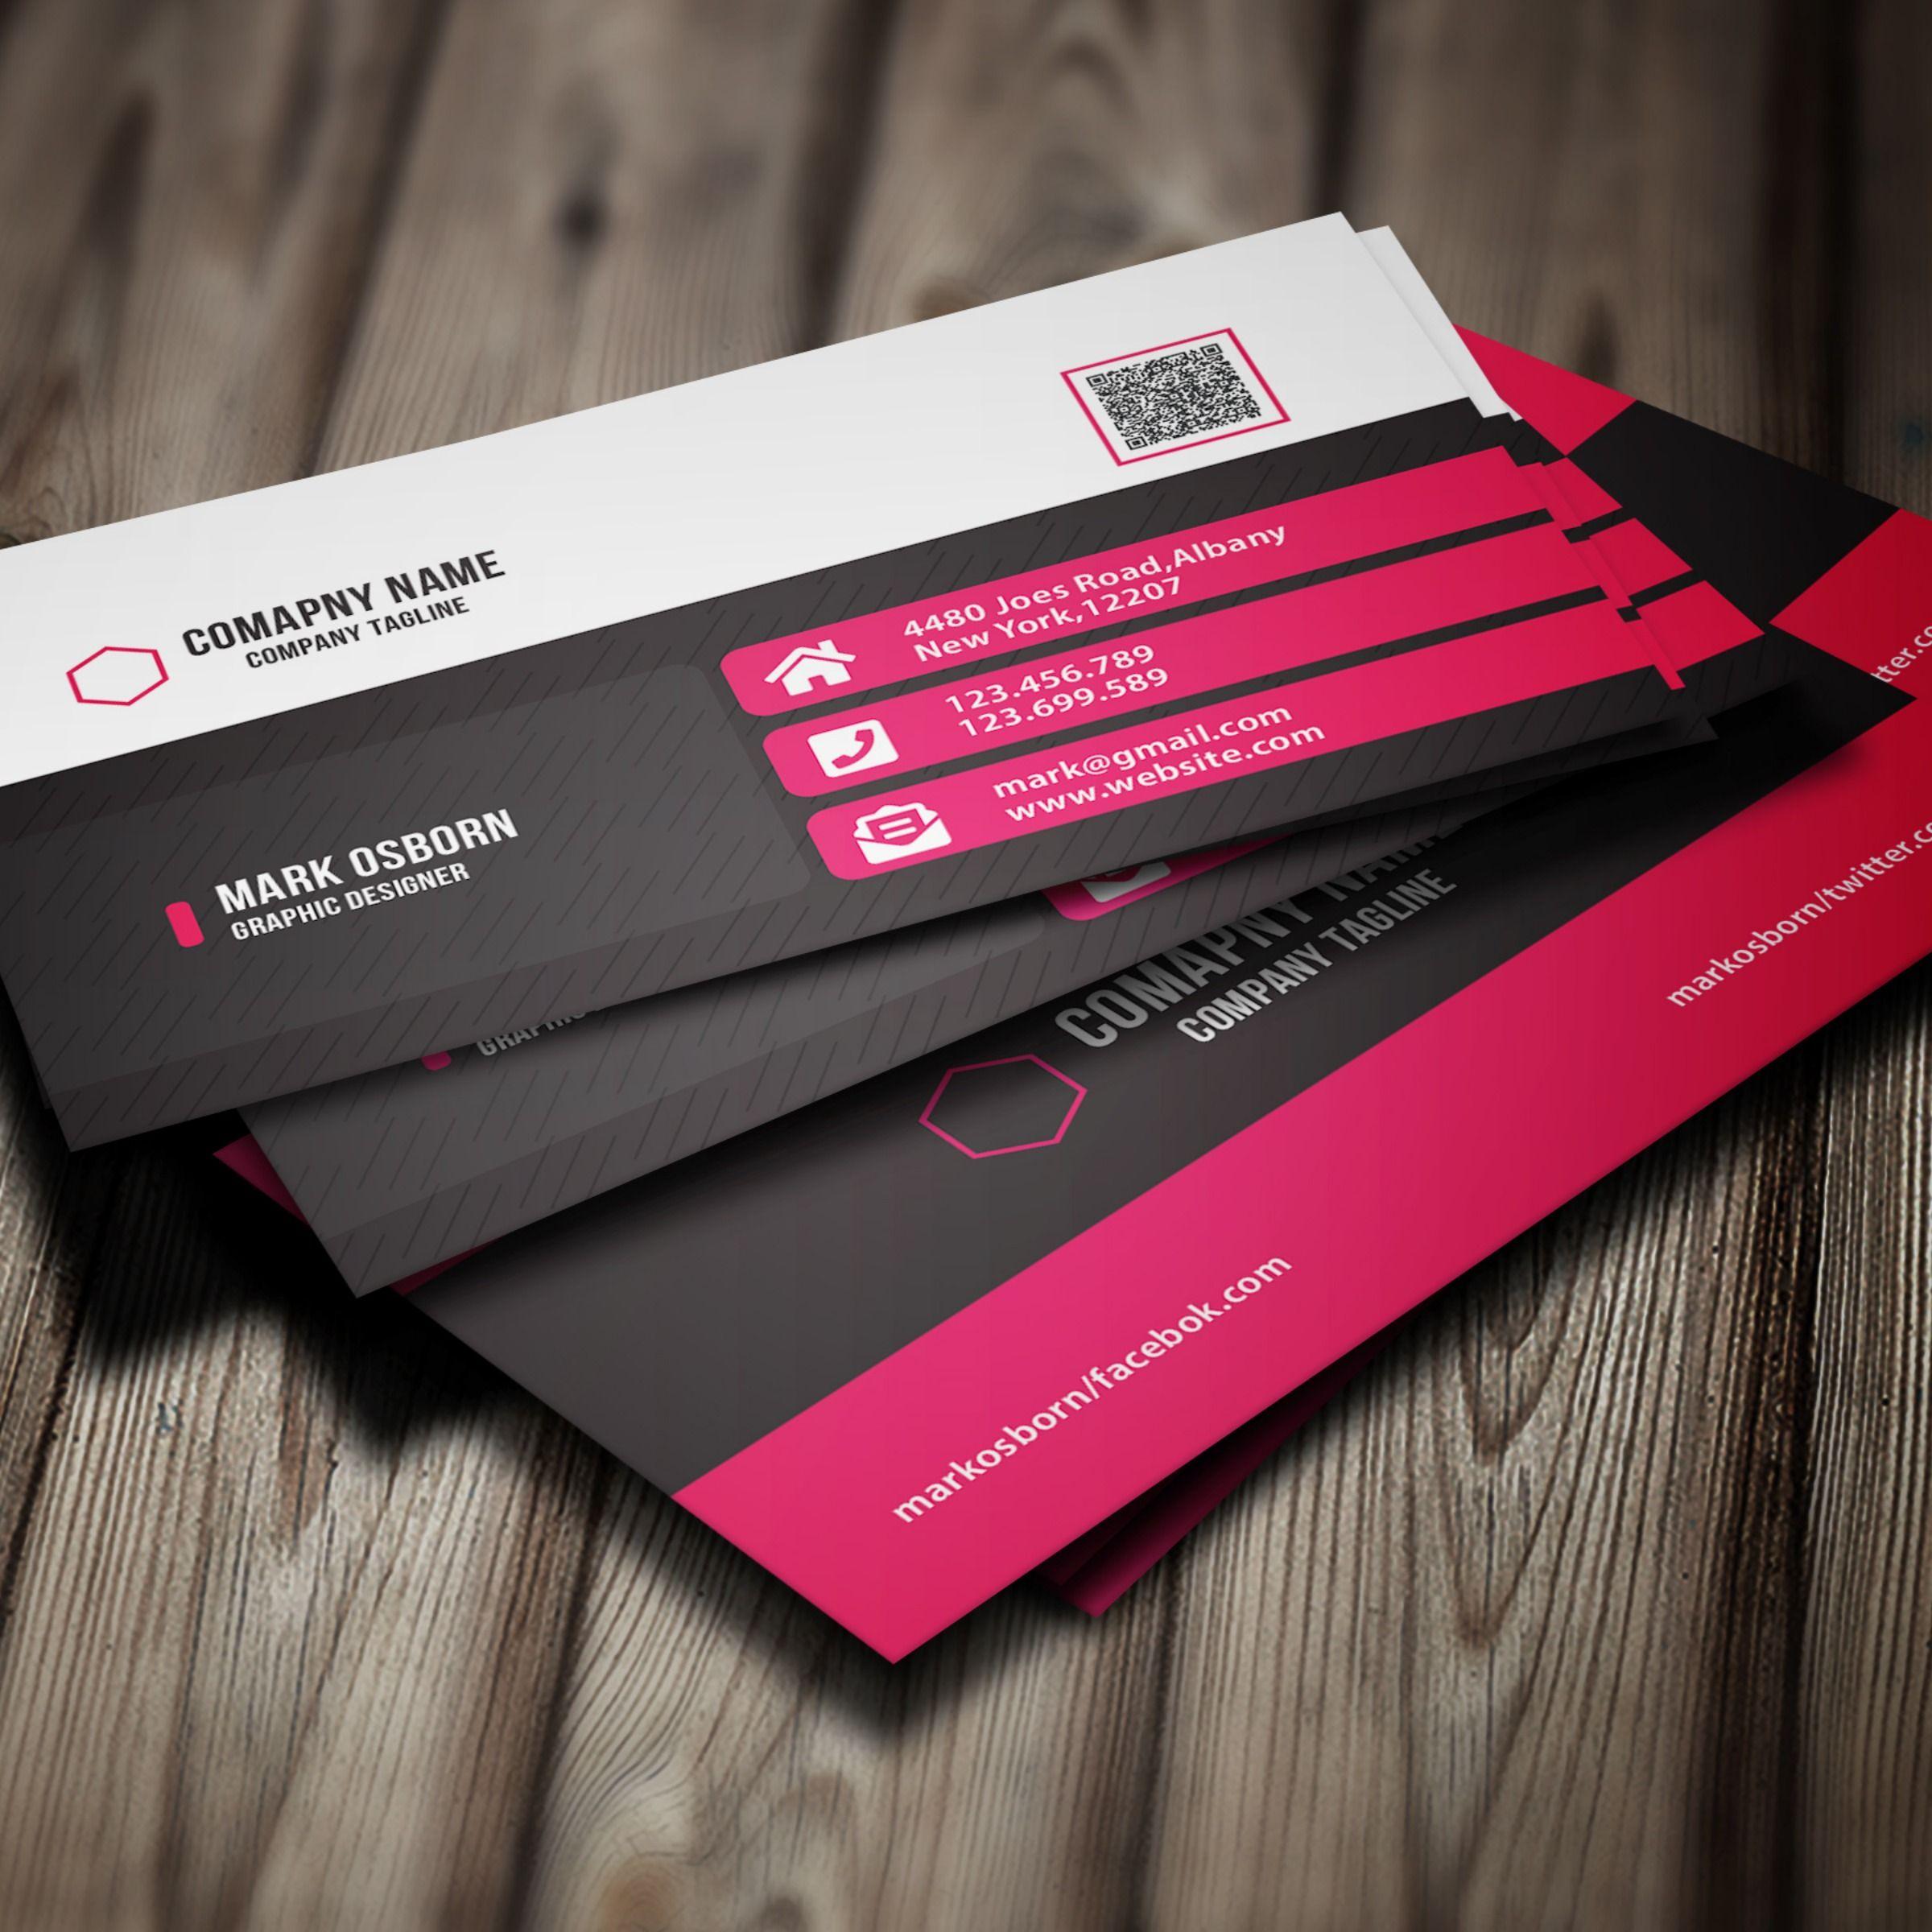 Minimalist Business Card Design Business Card Design Minimalist Business Cards Free Business Card Design